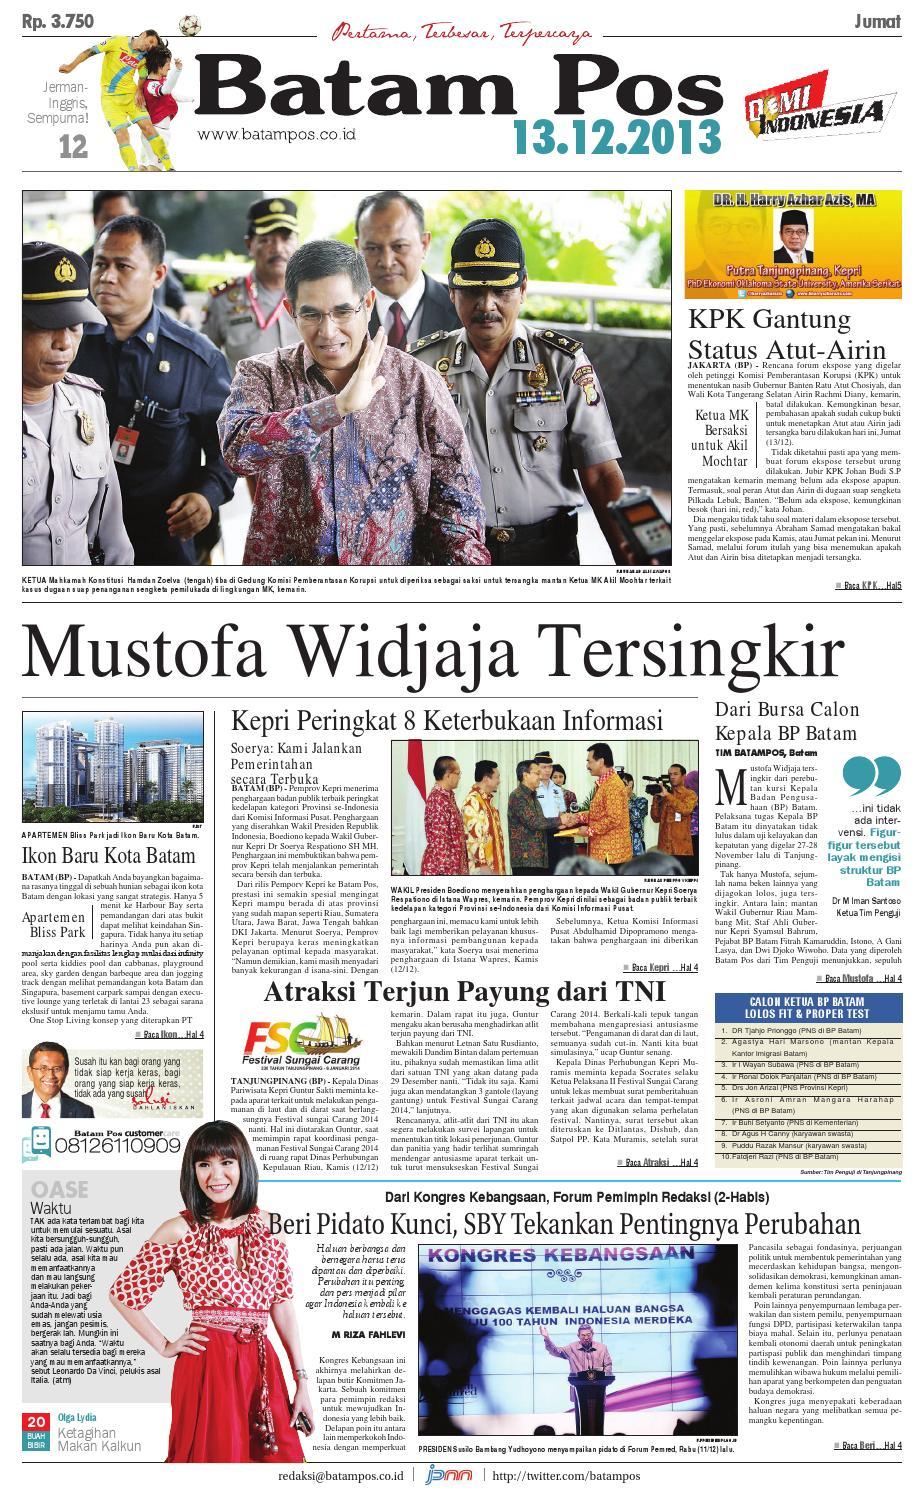 13 Desember 2013 By Batampos Newspaper Issuu Produk Ukm Bumn Kain Batik Middle Premium Sutera